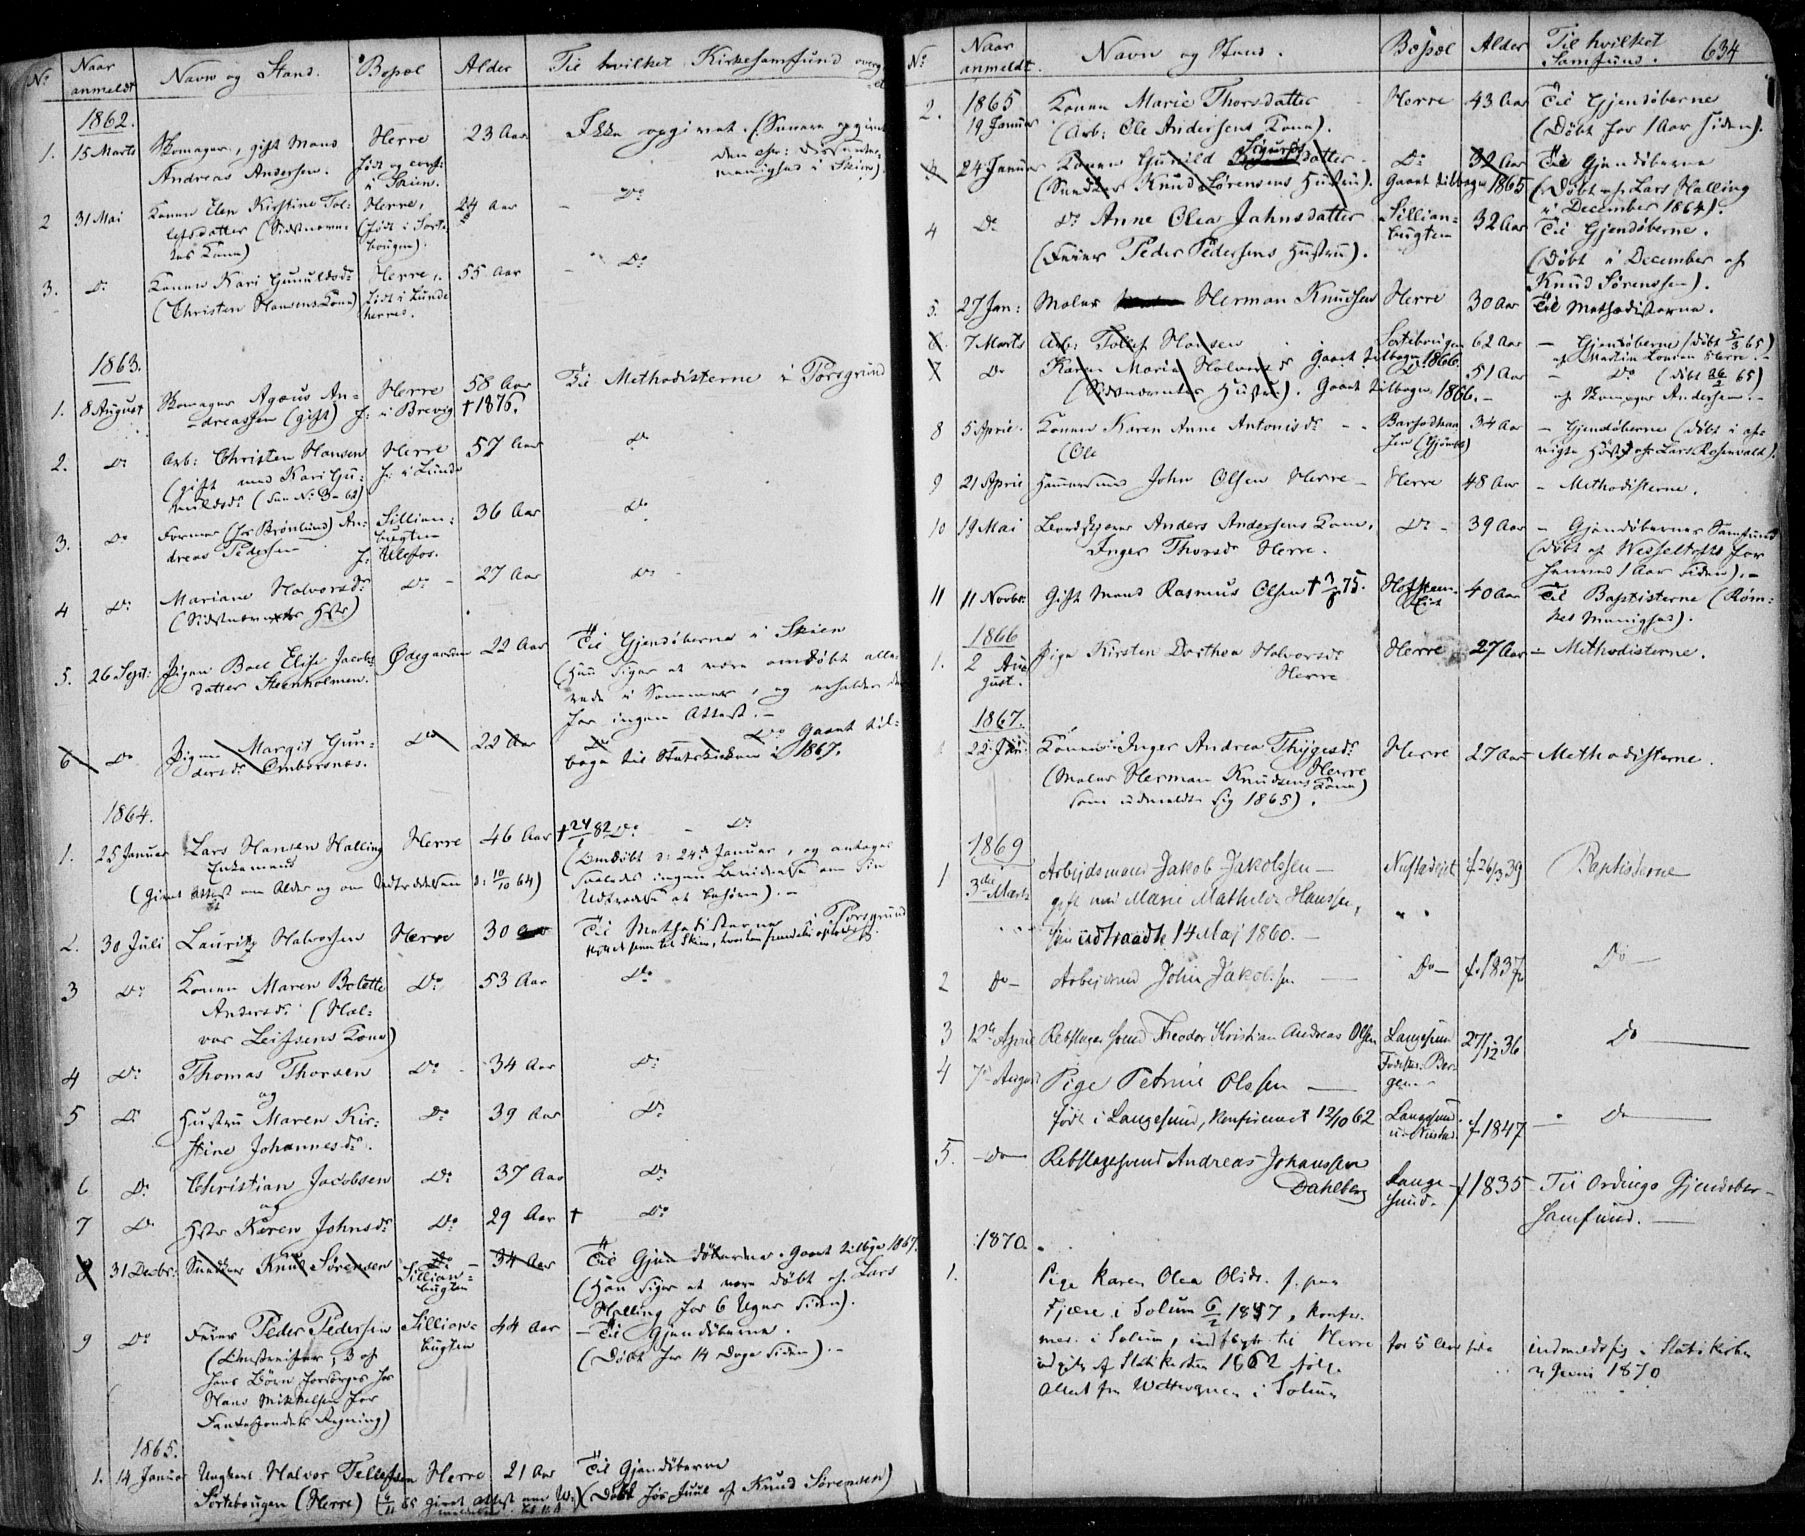 SAKO, Bamble kirkebøker, F/Fa/L0005: Ministerialbok nr. I 5, 1854-1869, s. 634